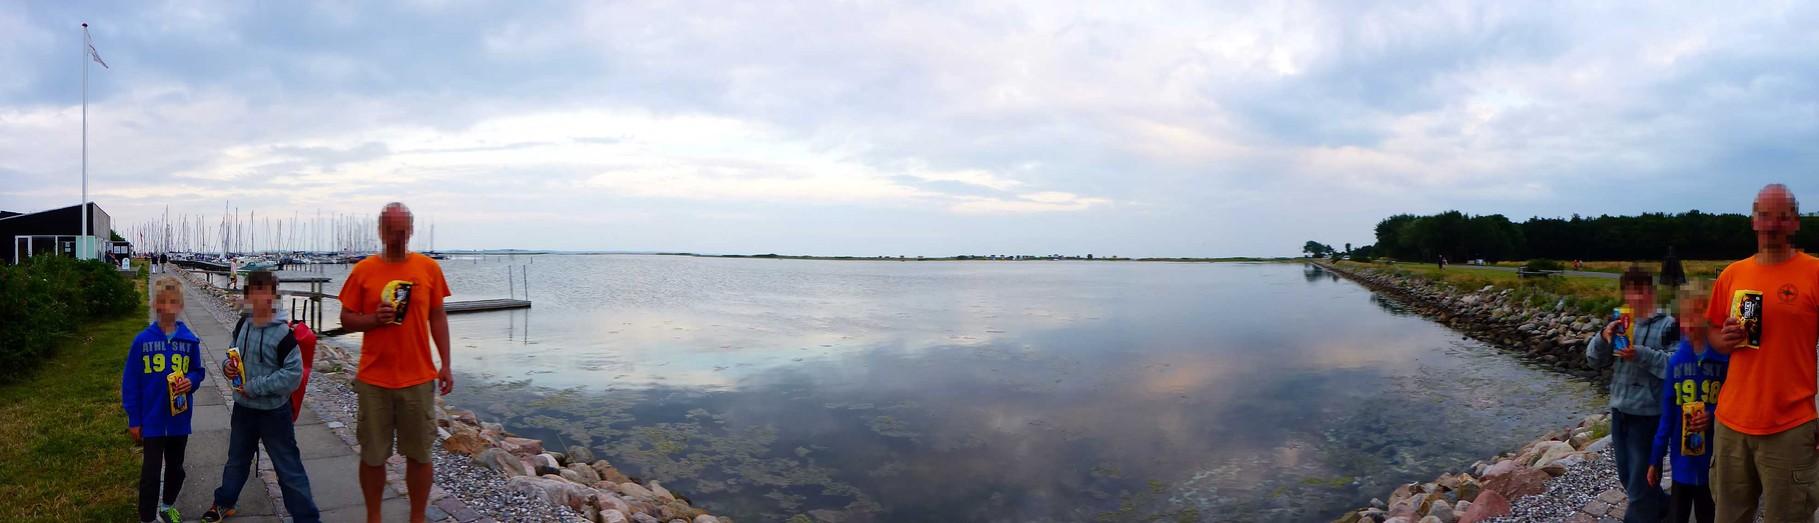 Panorma vom Marstaler Innenhafen